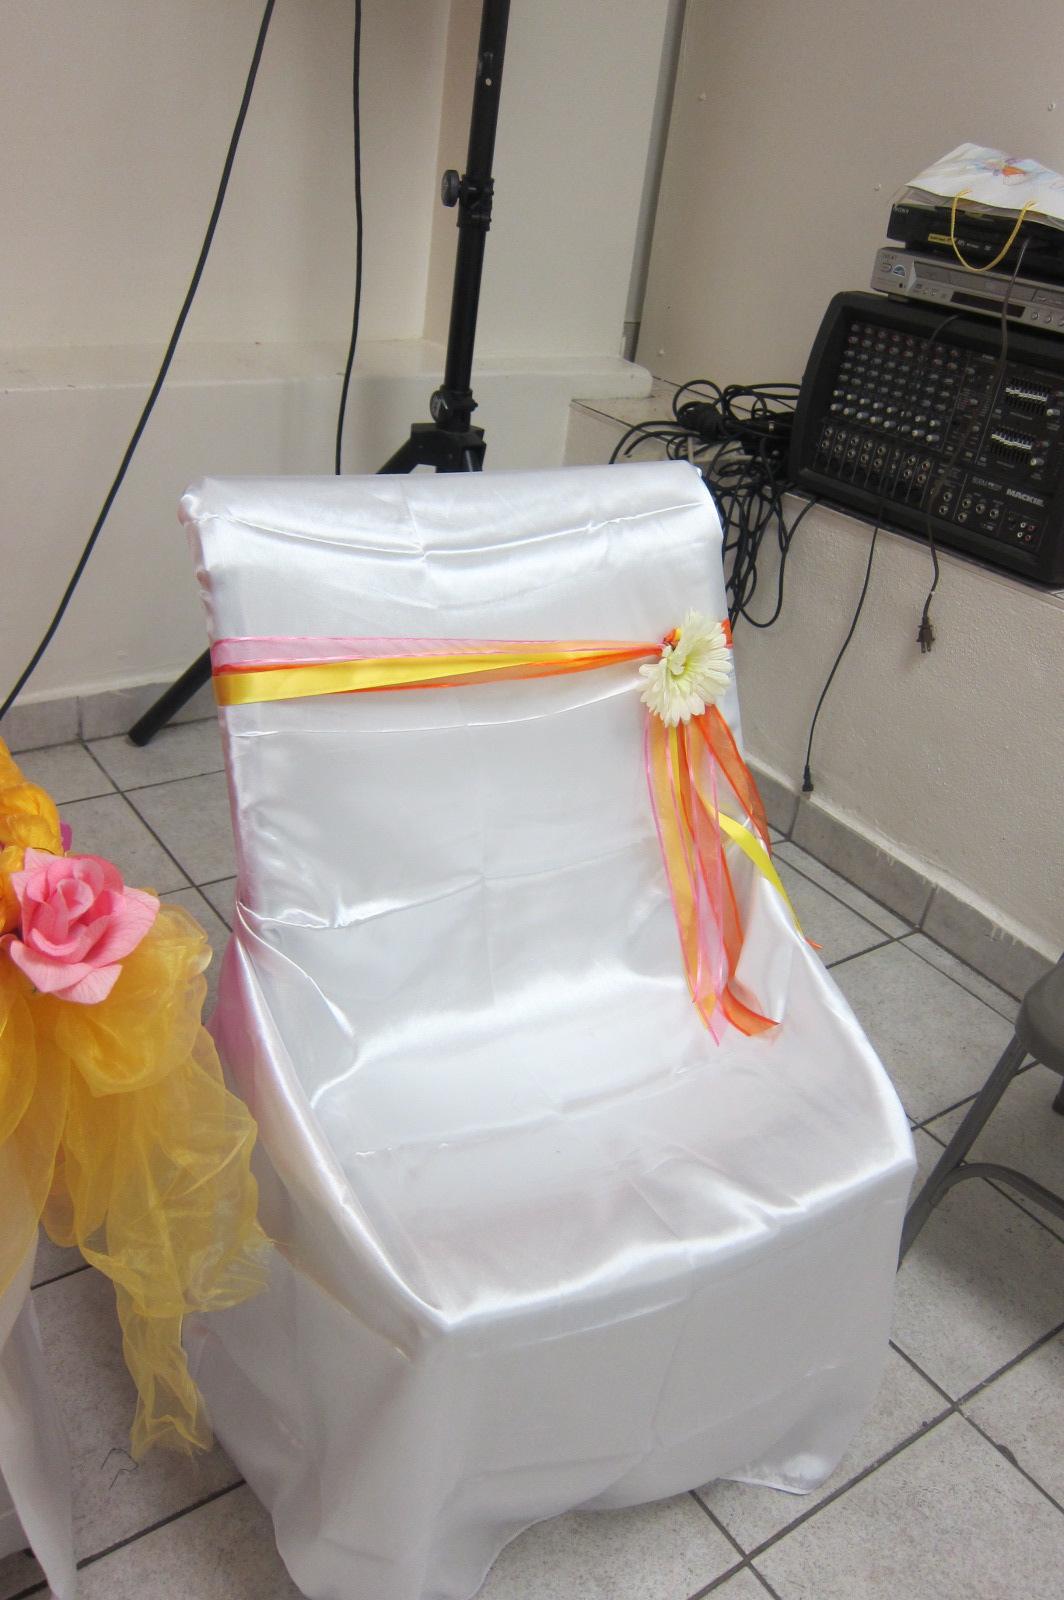 Amazing Sillas Para Baby Shower Gallery Craft Design Ideas My Life Mi Vida Baby  Shower 3 Salsuba